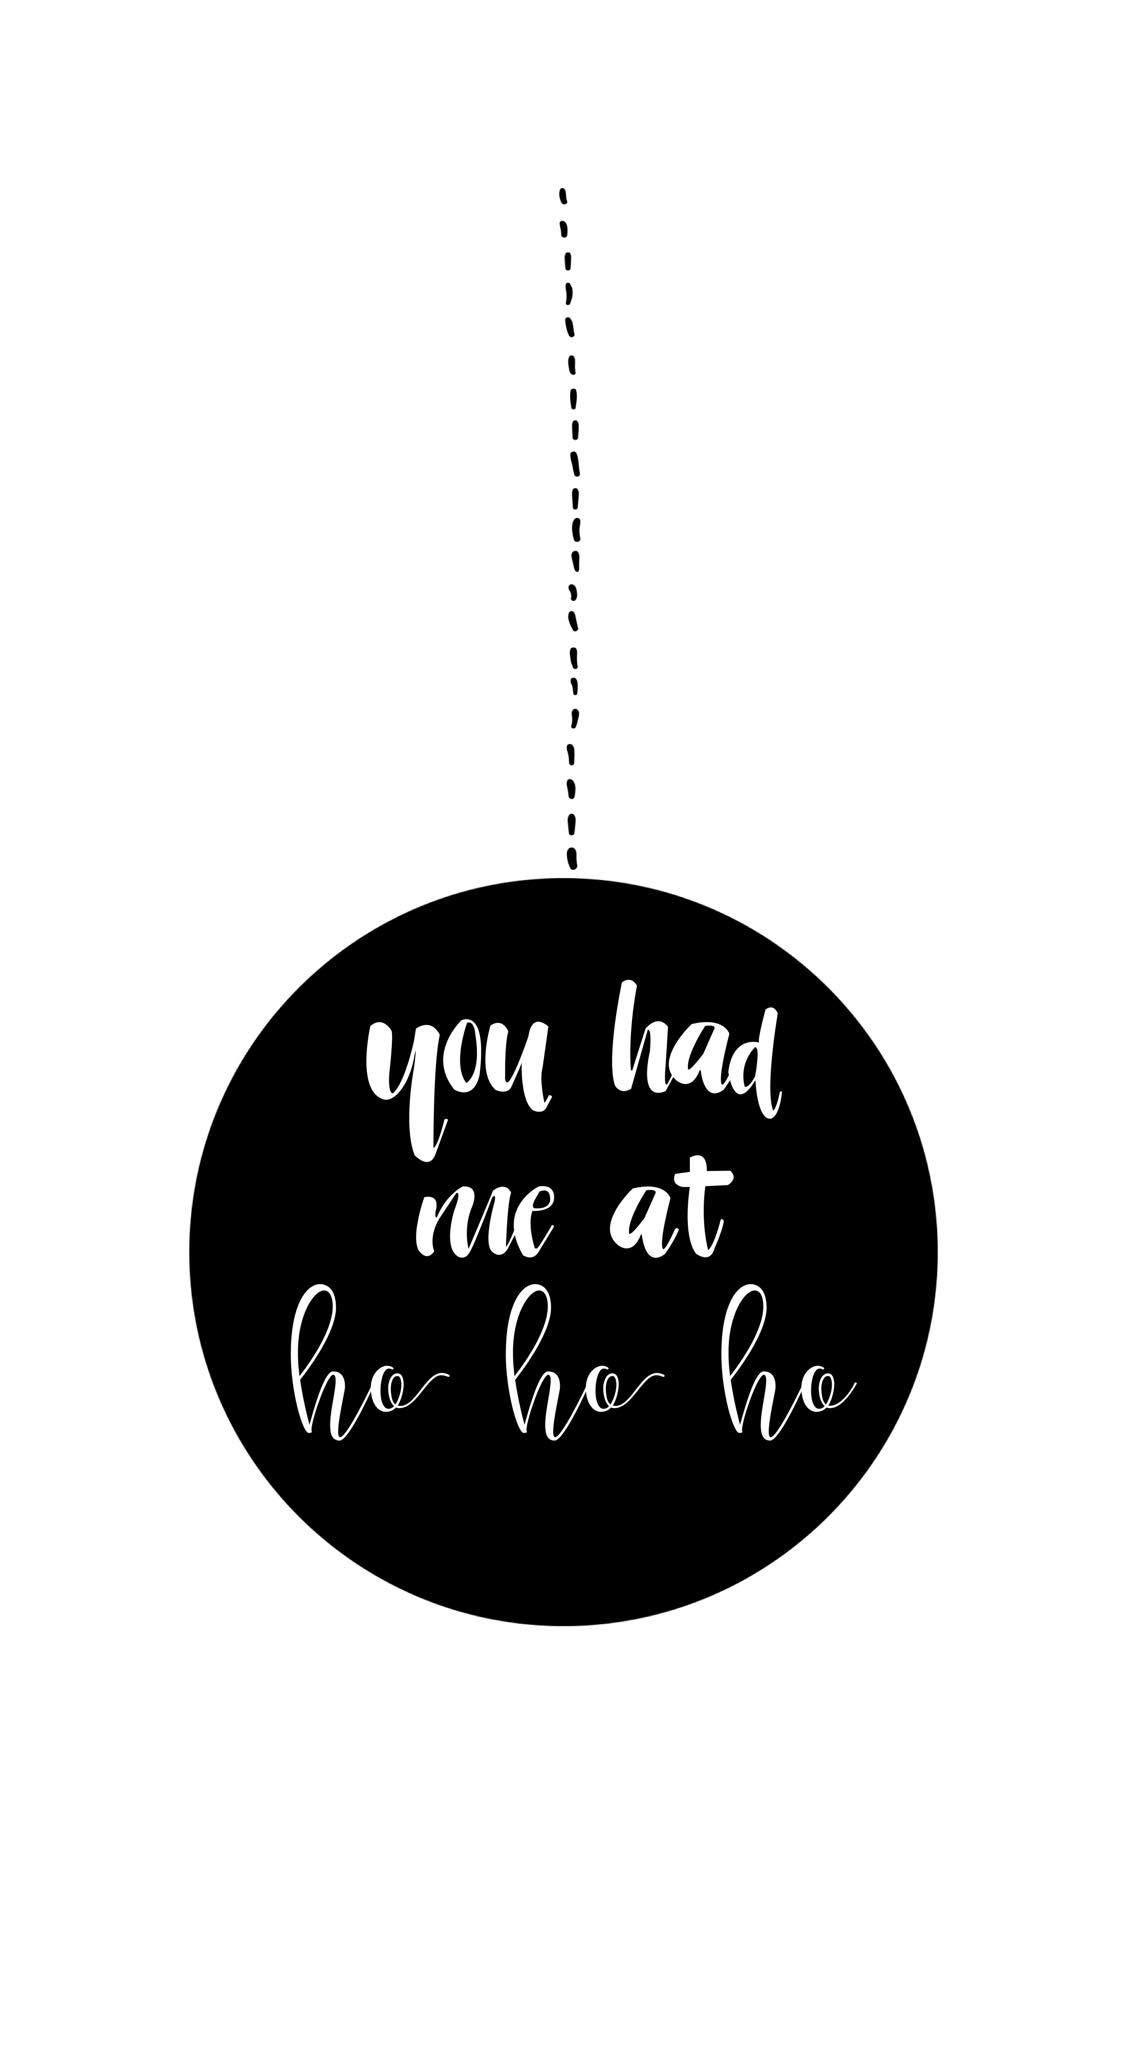 Phone Wallpaper, Wallpaper iPhone, Wallpaper, Hintergrund, Handy Hintergrund, Christmas Wallpaper, Weihnachten Wallpaper, Christmas Feeling, Christmas Quote, Quote, Quotes, Quote of the day, christmassy, ho ho ho, christmas tree, wallpaper for christmas, christmas hurray,  christmas lights, gingerbread, hot tea, kindness, happy minds, santa